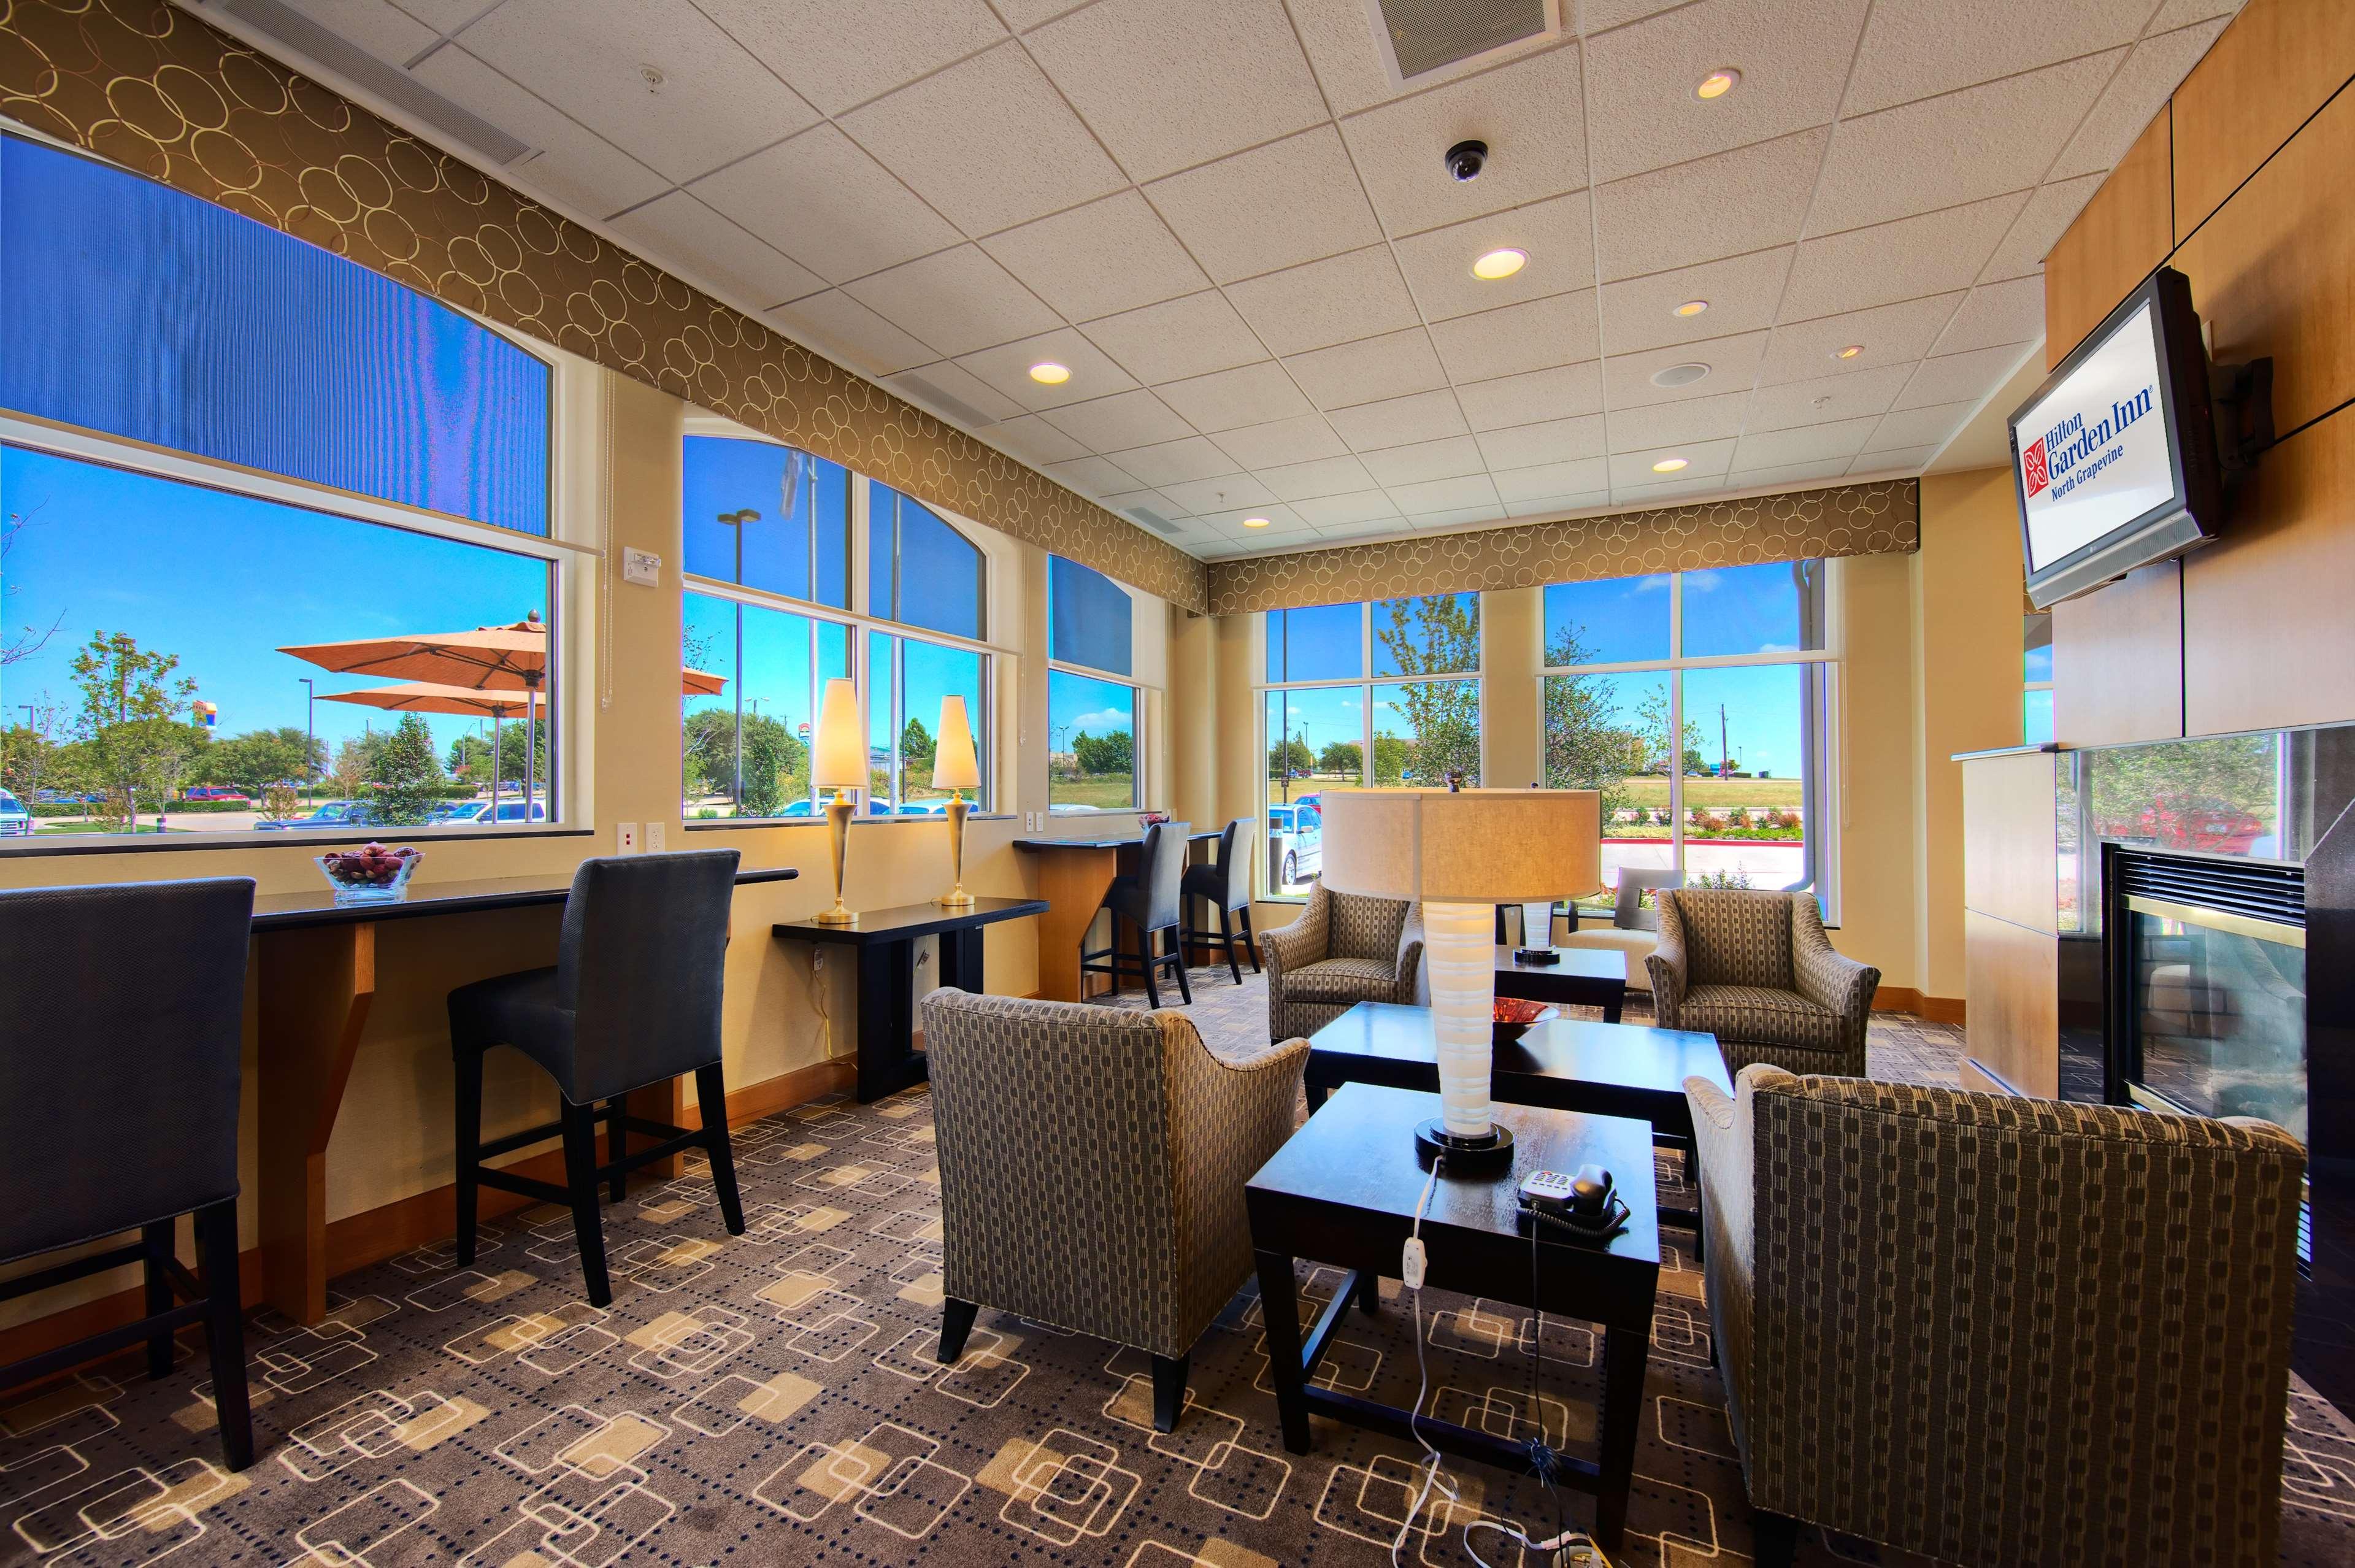 Hilton Garden Inn DFW North Grapevine image 6